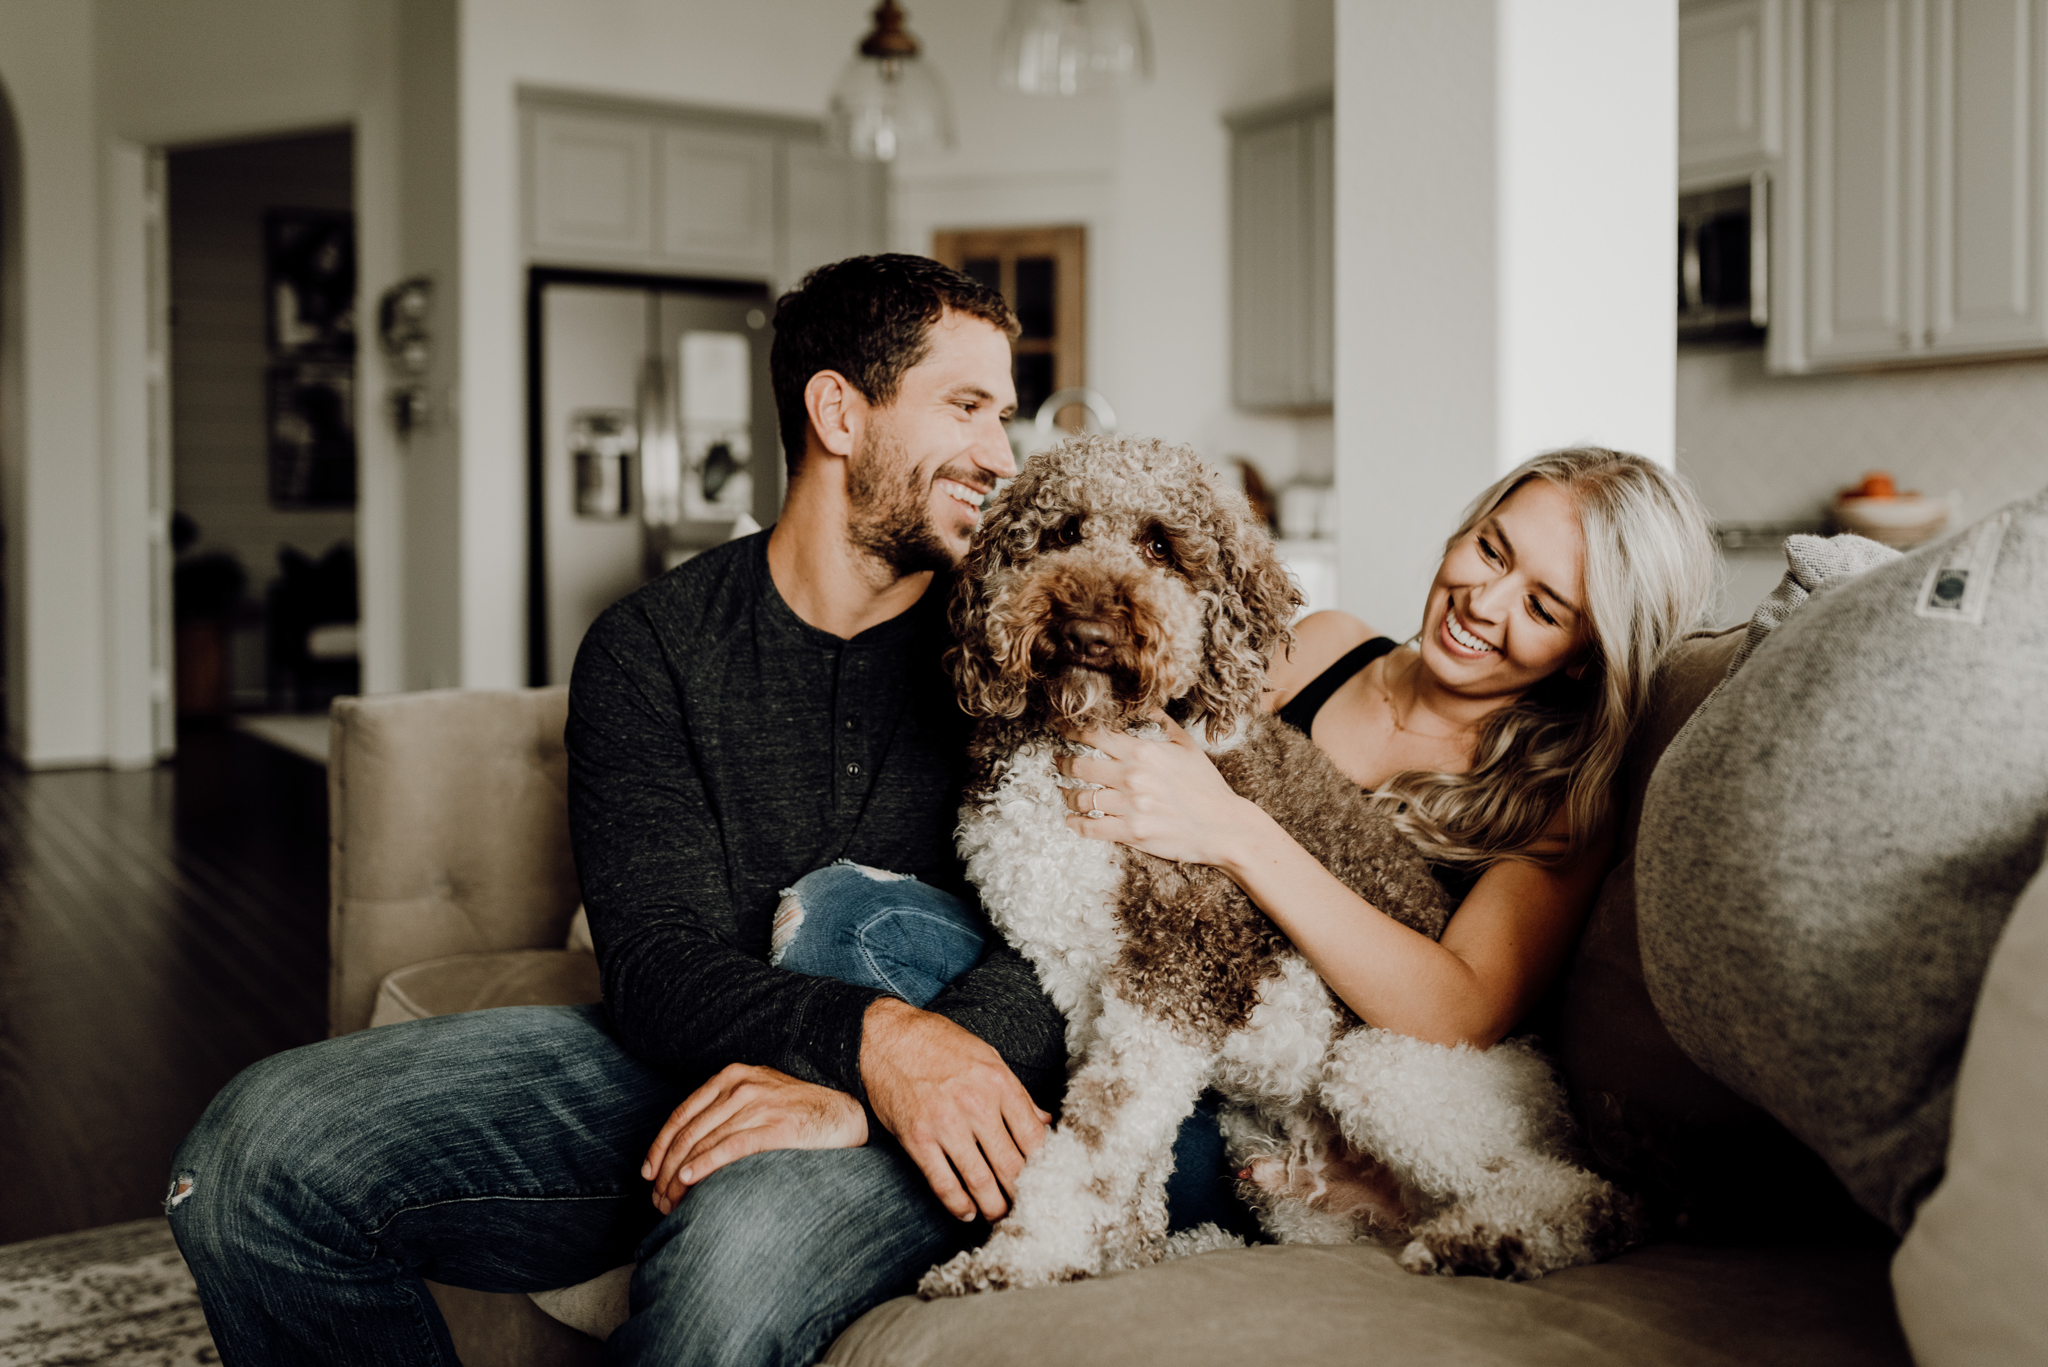 Houston Wedding Photographer-Houston In Home Engagement Session- Houston Wedding Photographer -Kristen Giles Photography-121.jpg